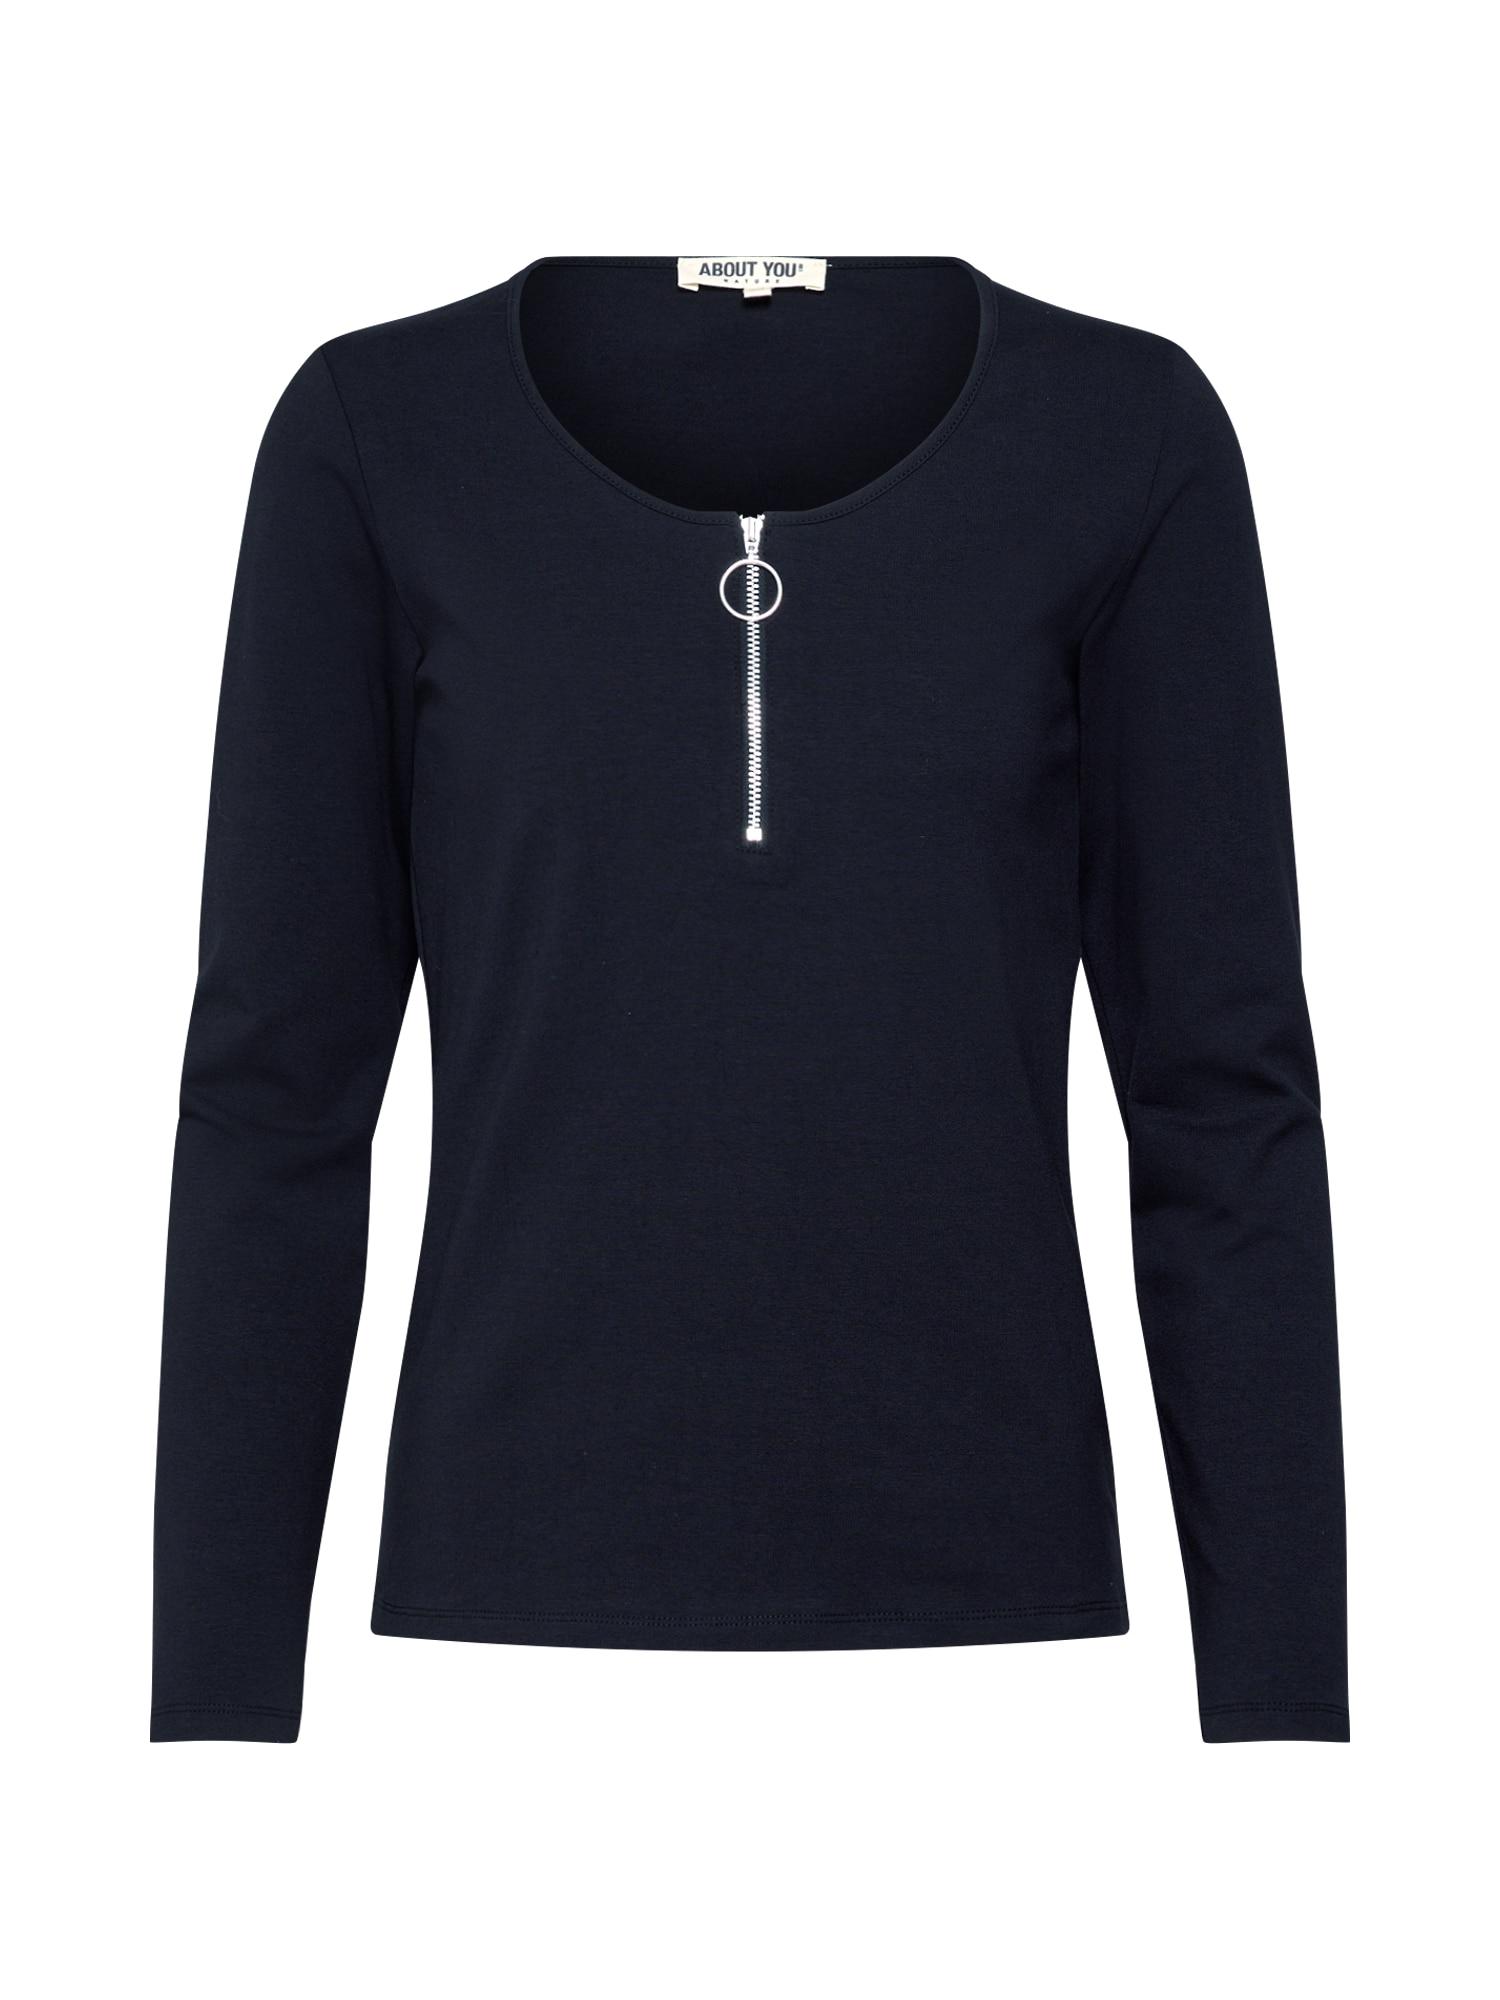 ABOUT YOU Marškinėliai 'Lionne' juoda